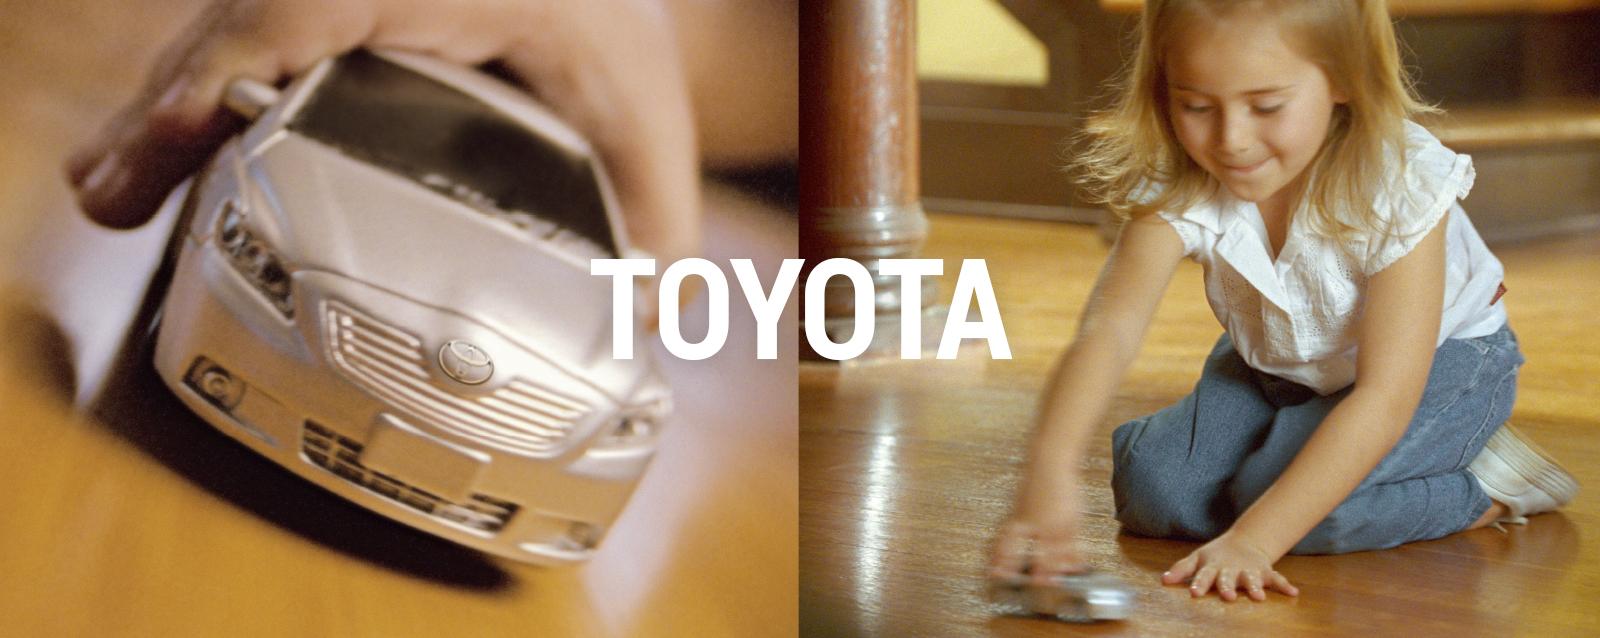 Creative_assets_Updated_8_30_17_Toyota2.jpg